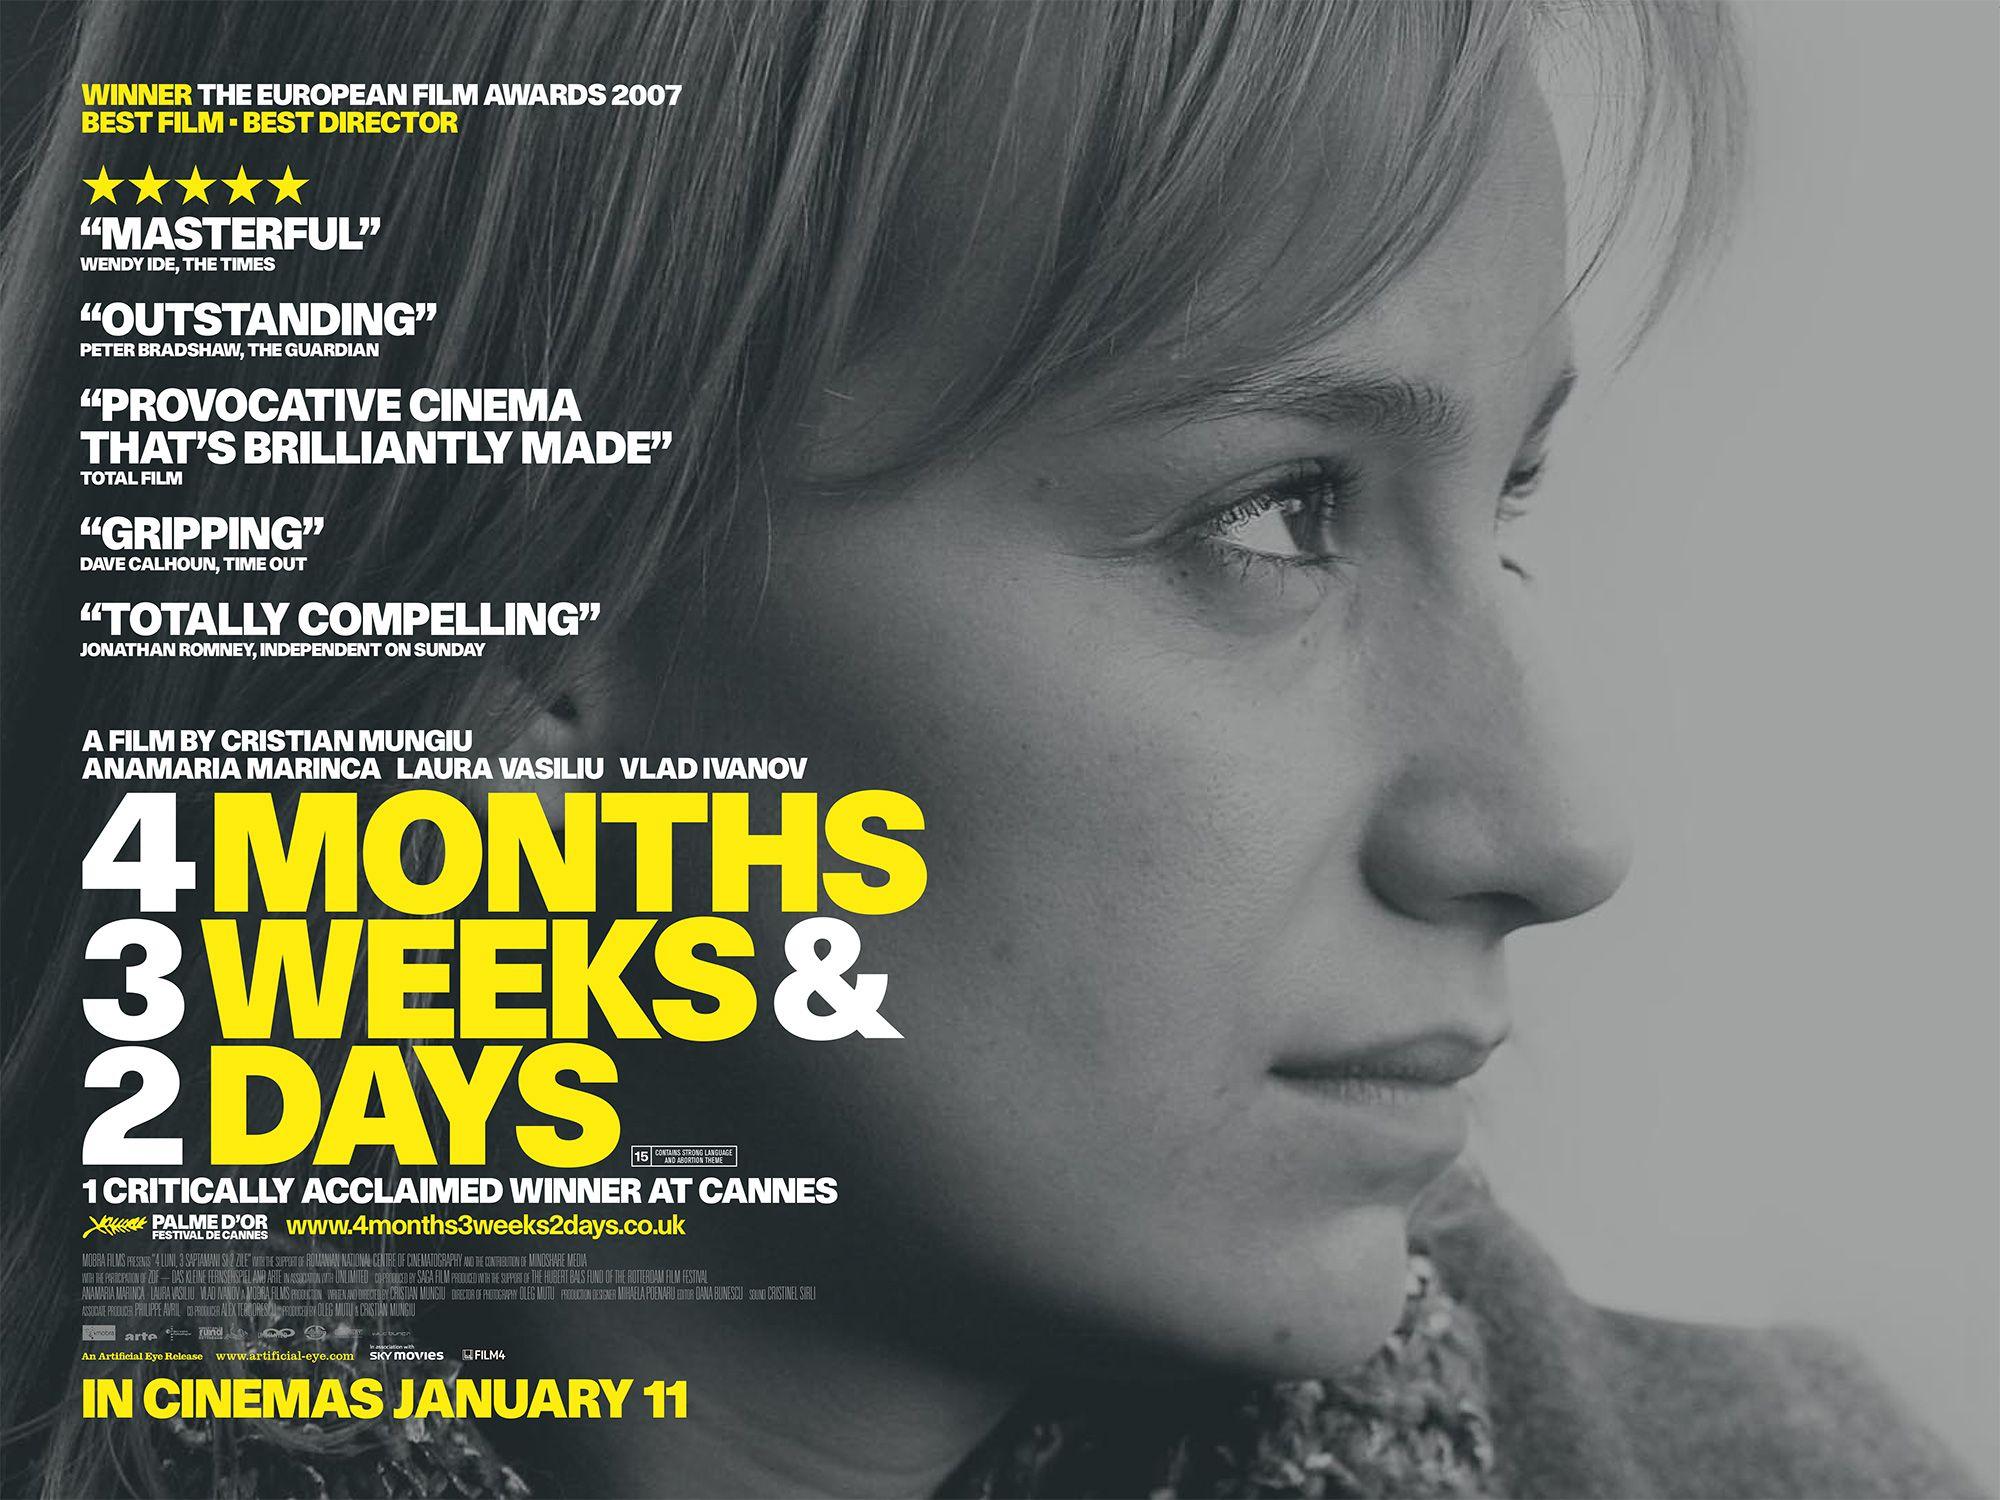 4 months 3 weeks and 2 days dvd movie online subtitles | nalima